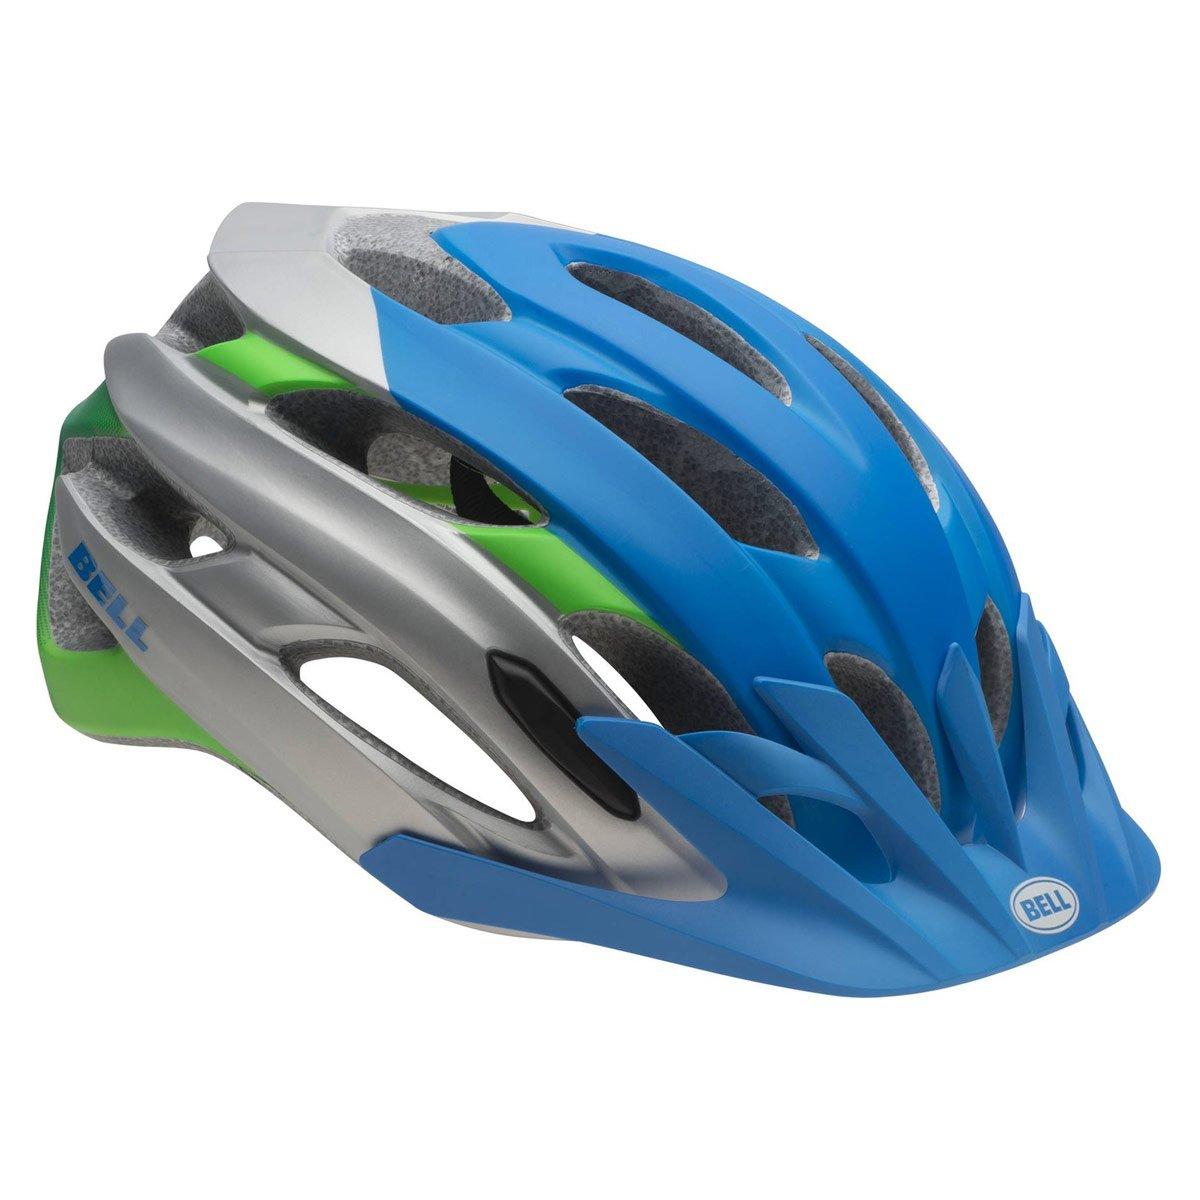 Bell Erwachsene Helm EVENT XC 16 super